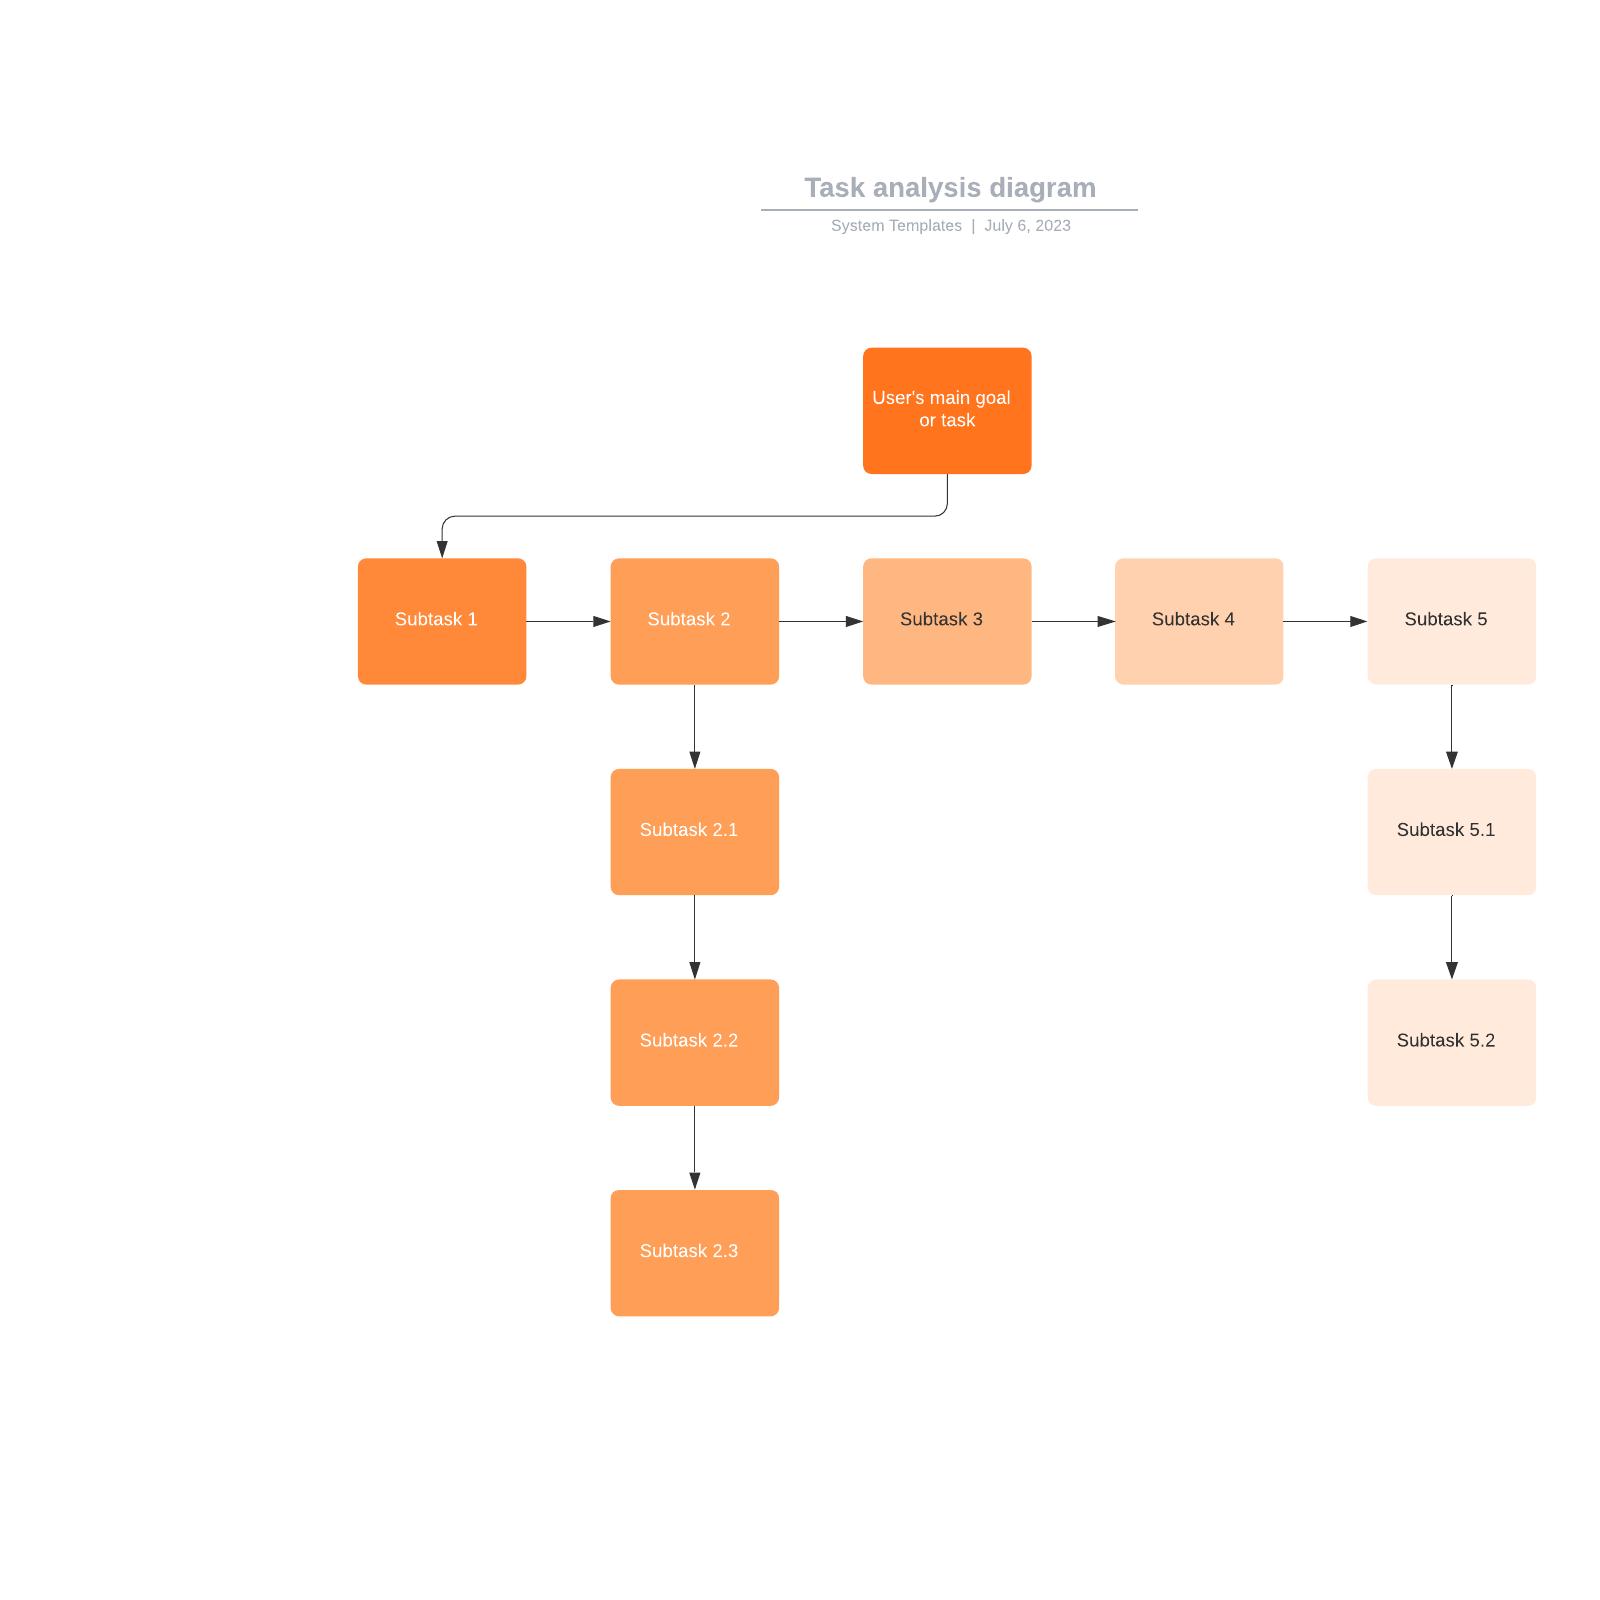 Task analysis diagram